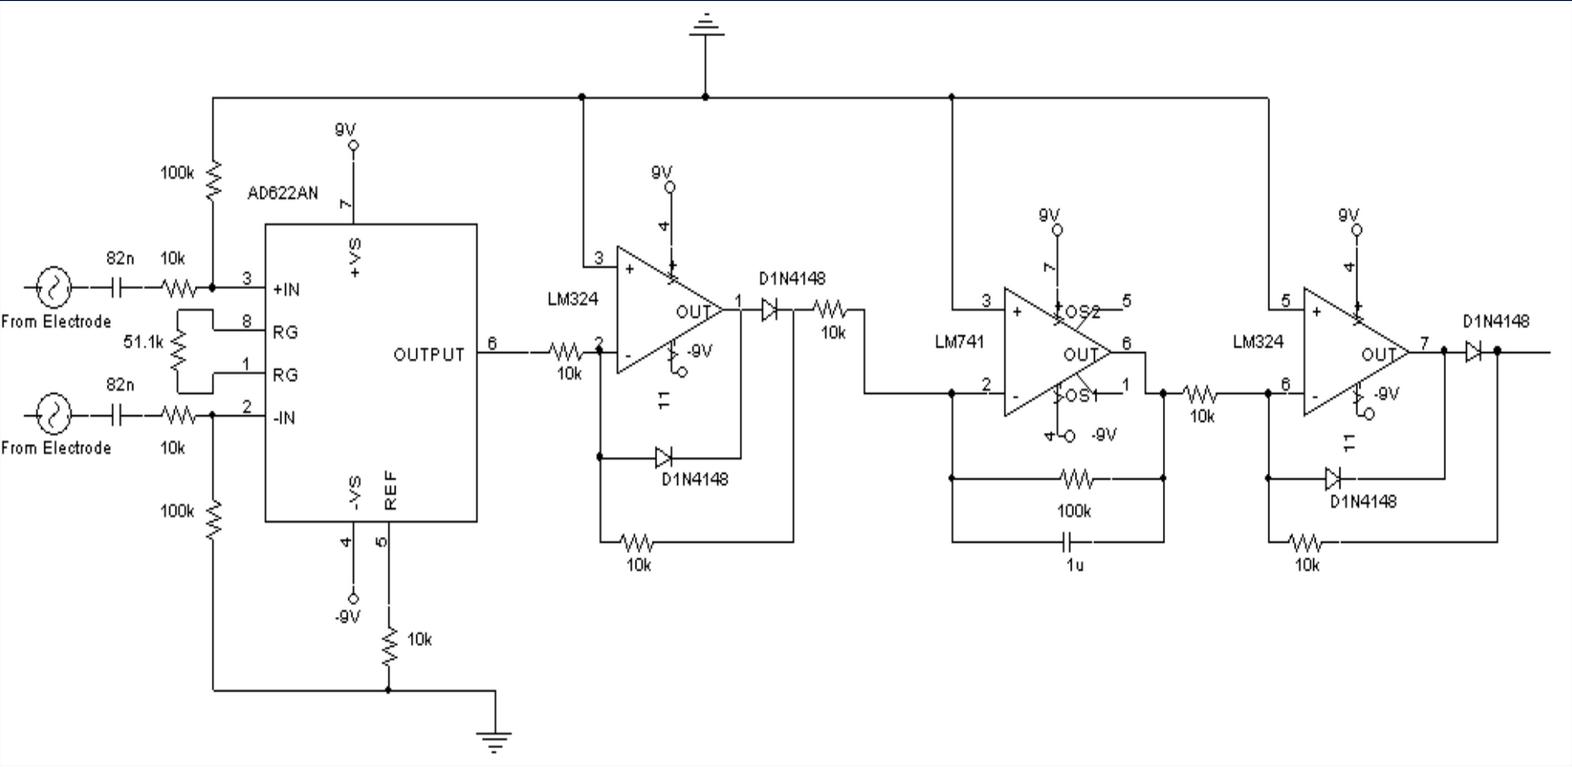 Has anybody used the brain wave eeg sensor? : arduino